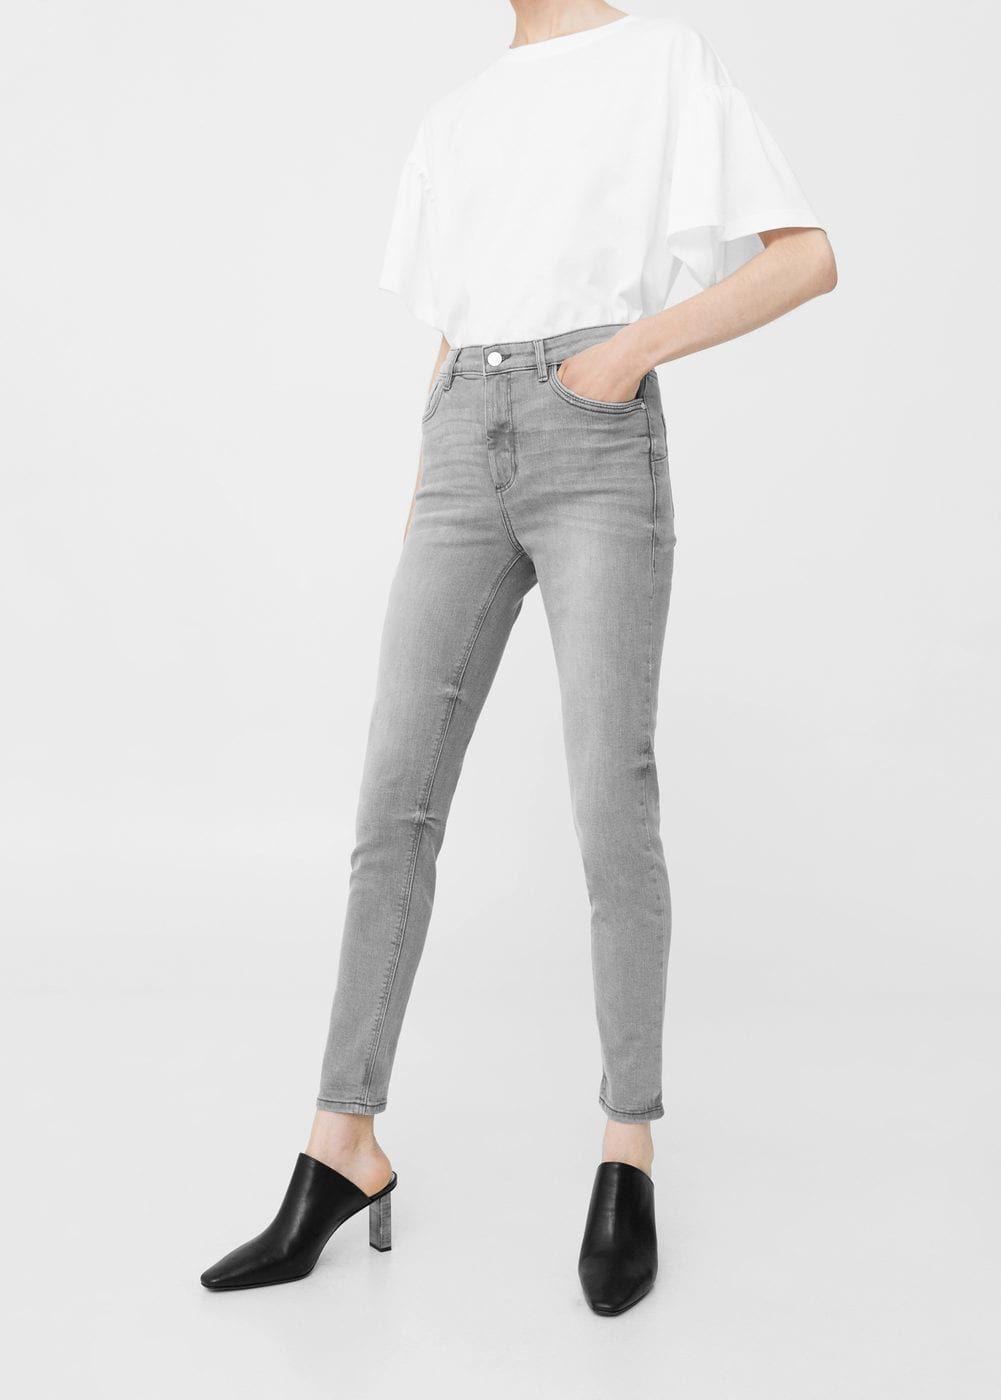 4bc0595890f Skinny noa jeans - Woman